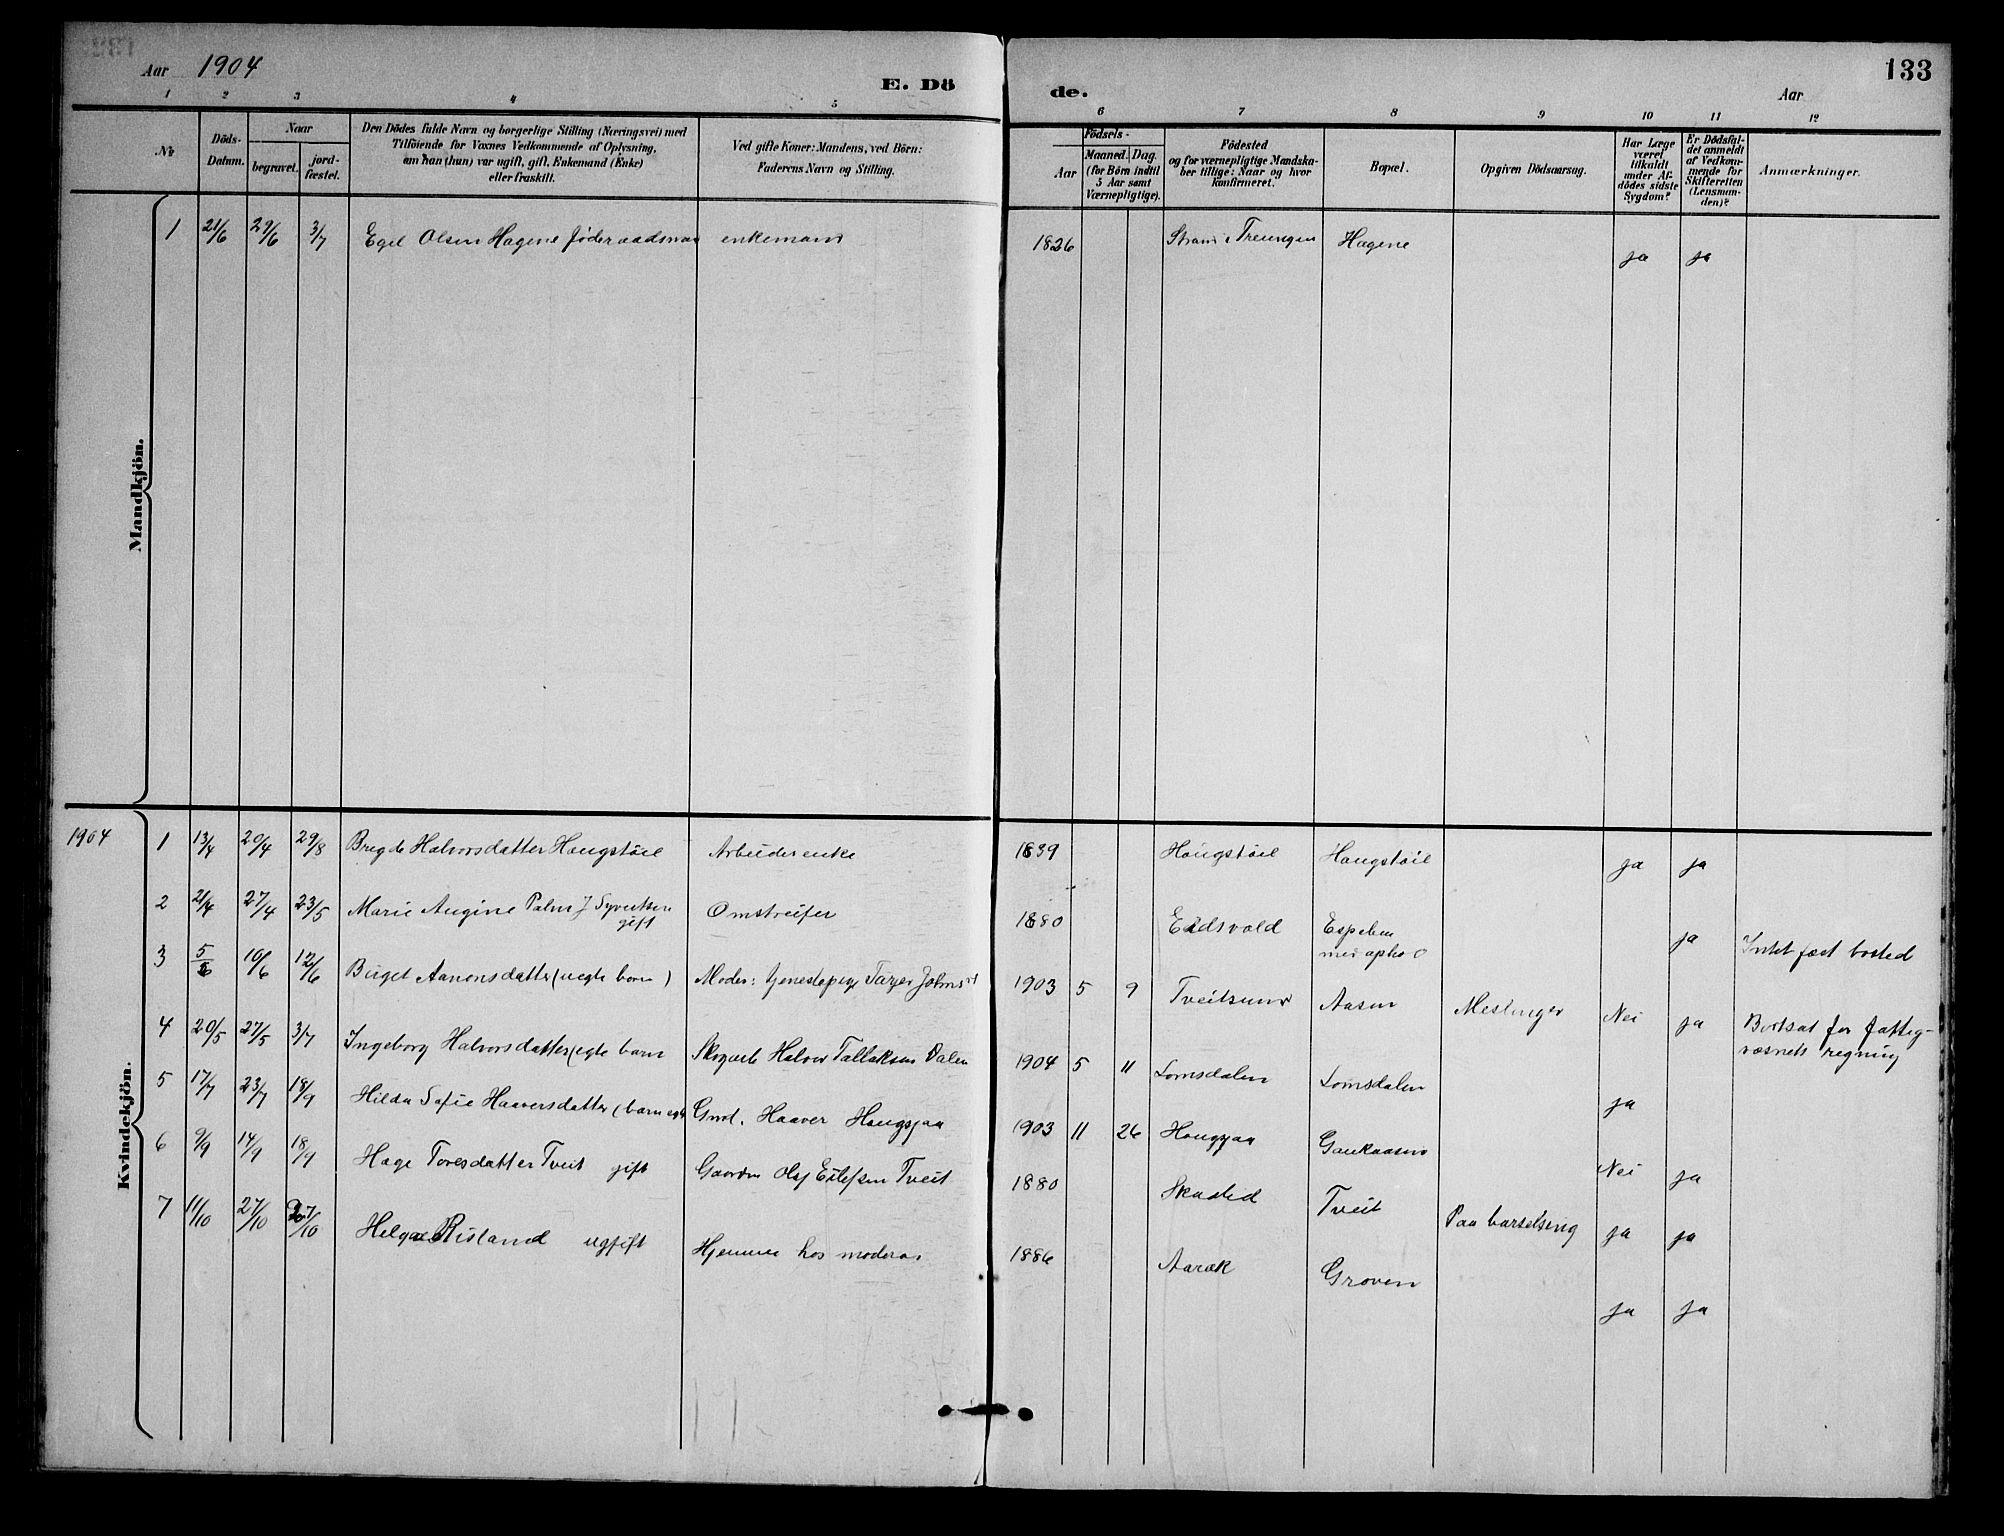 SAKO, Nissedal kirkebøker, G/Gb/L0003: Klokkerbok nr. II 3, 1893-1928, s. 133